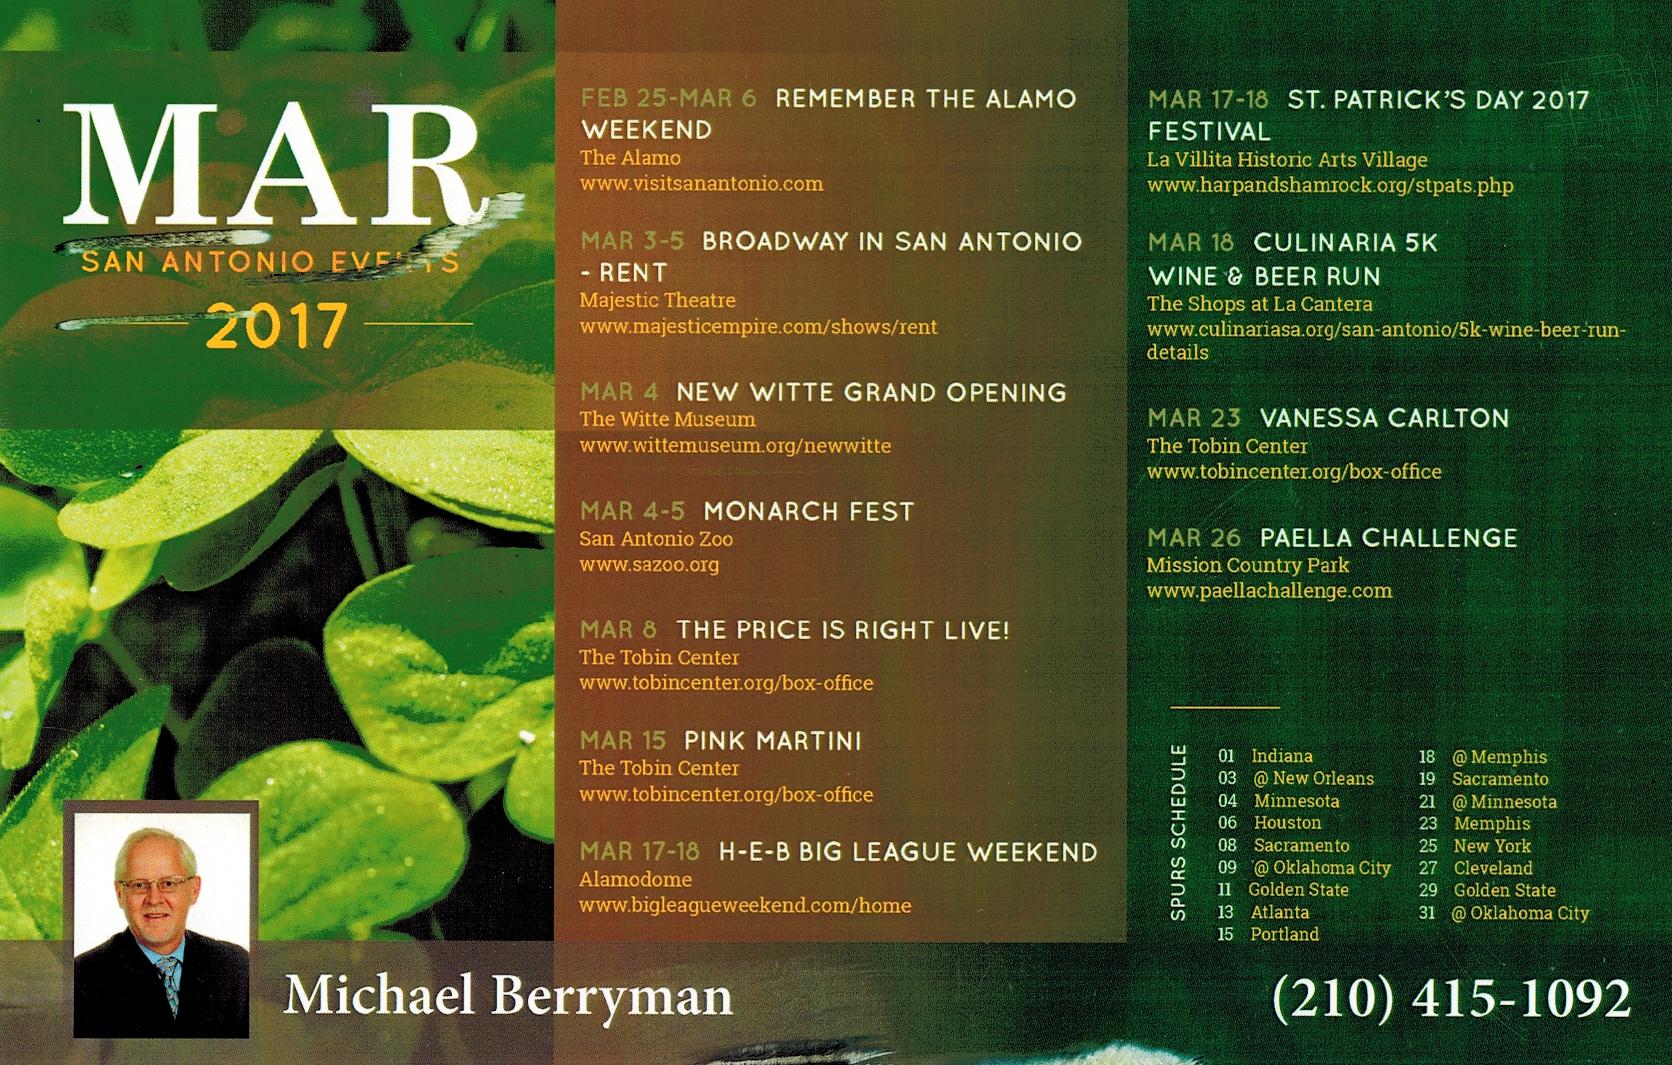 Michael Berryman, Realtor